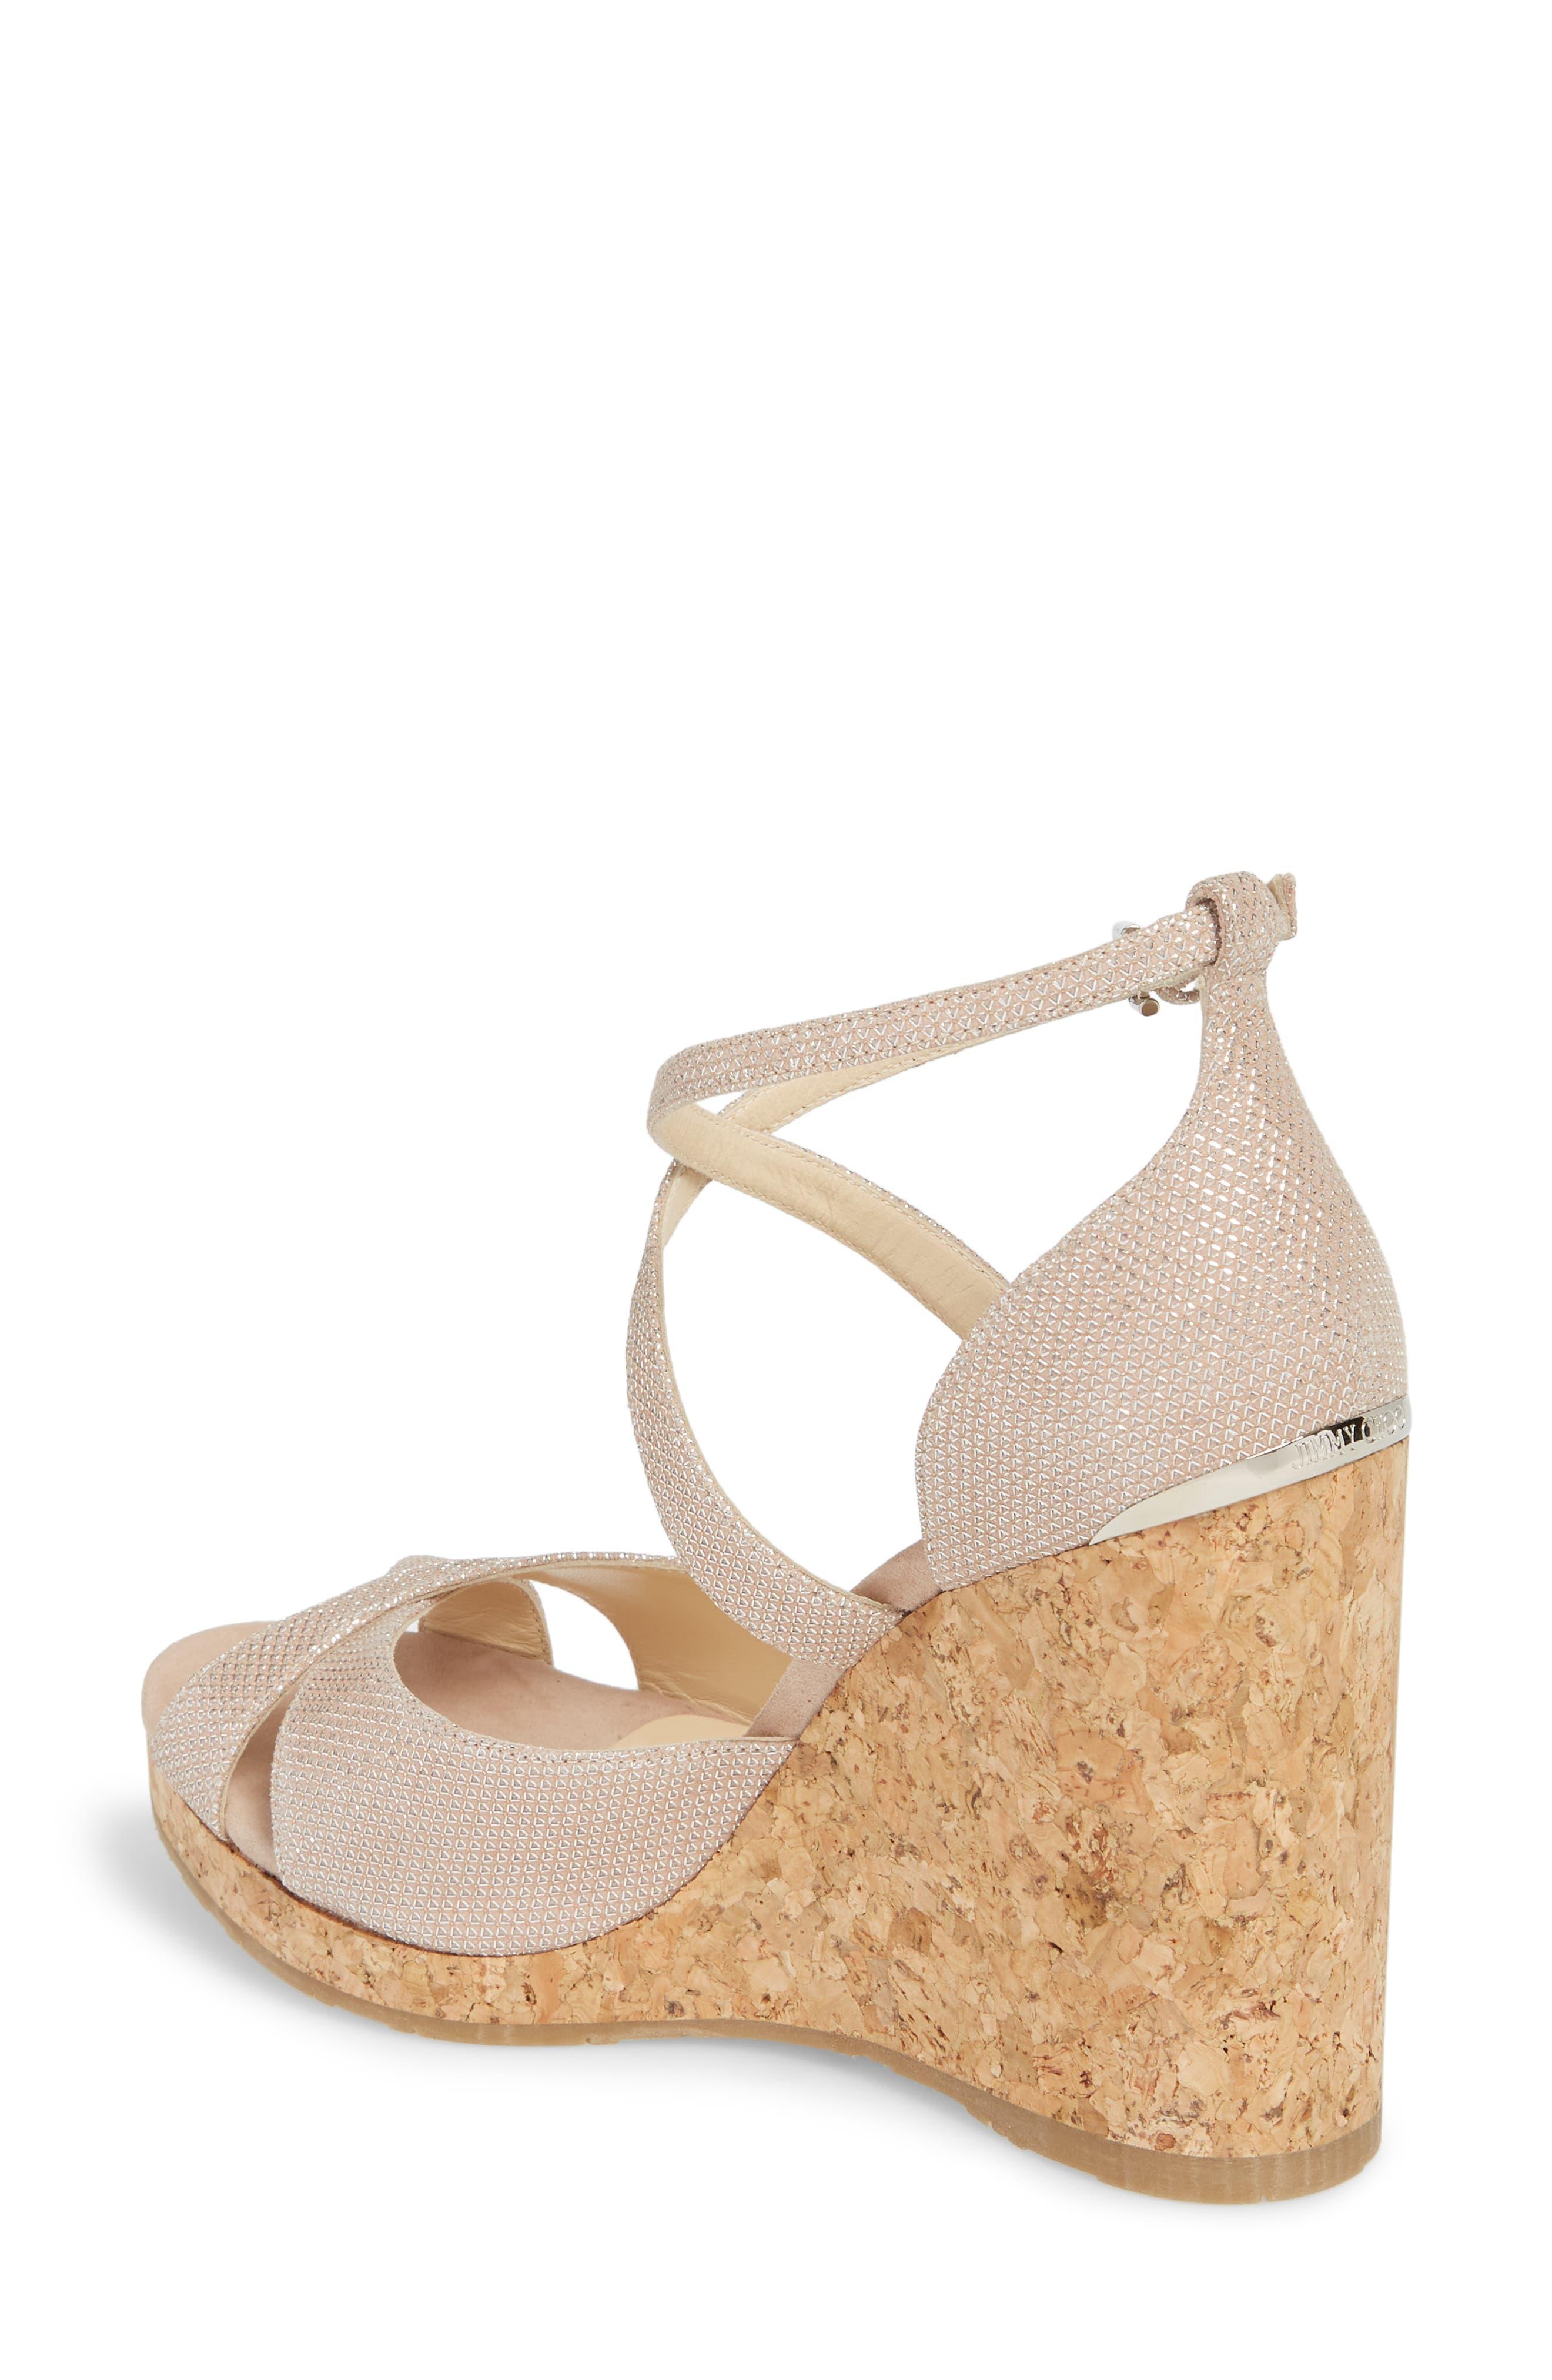 Alanah Espadrille Wedge Sandal,                             Alternate thumbnail 2, color,                             Ballet Pink Glitter